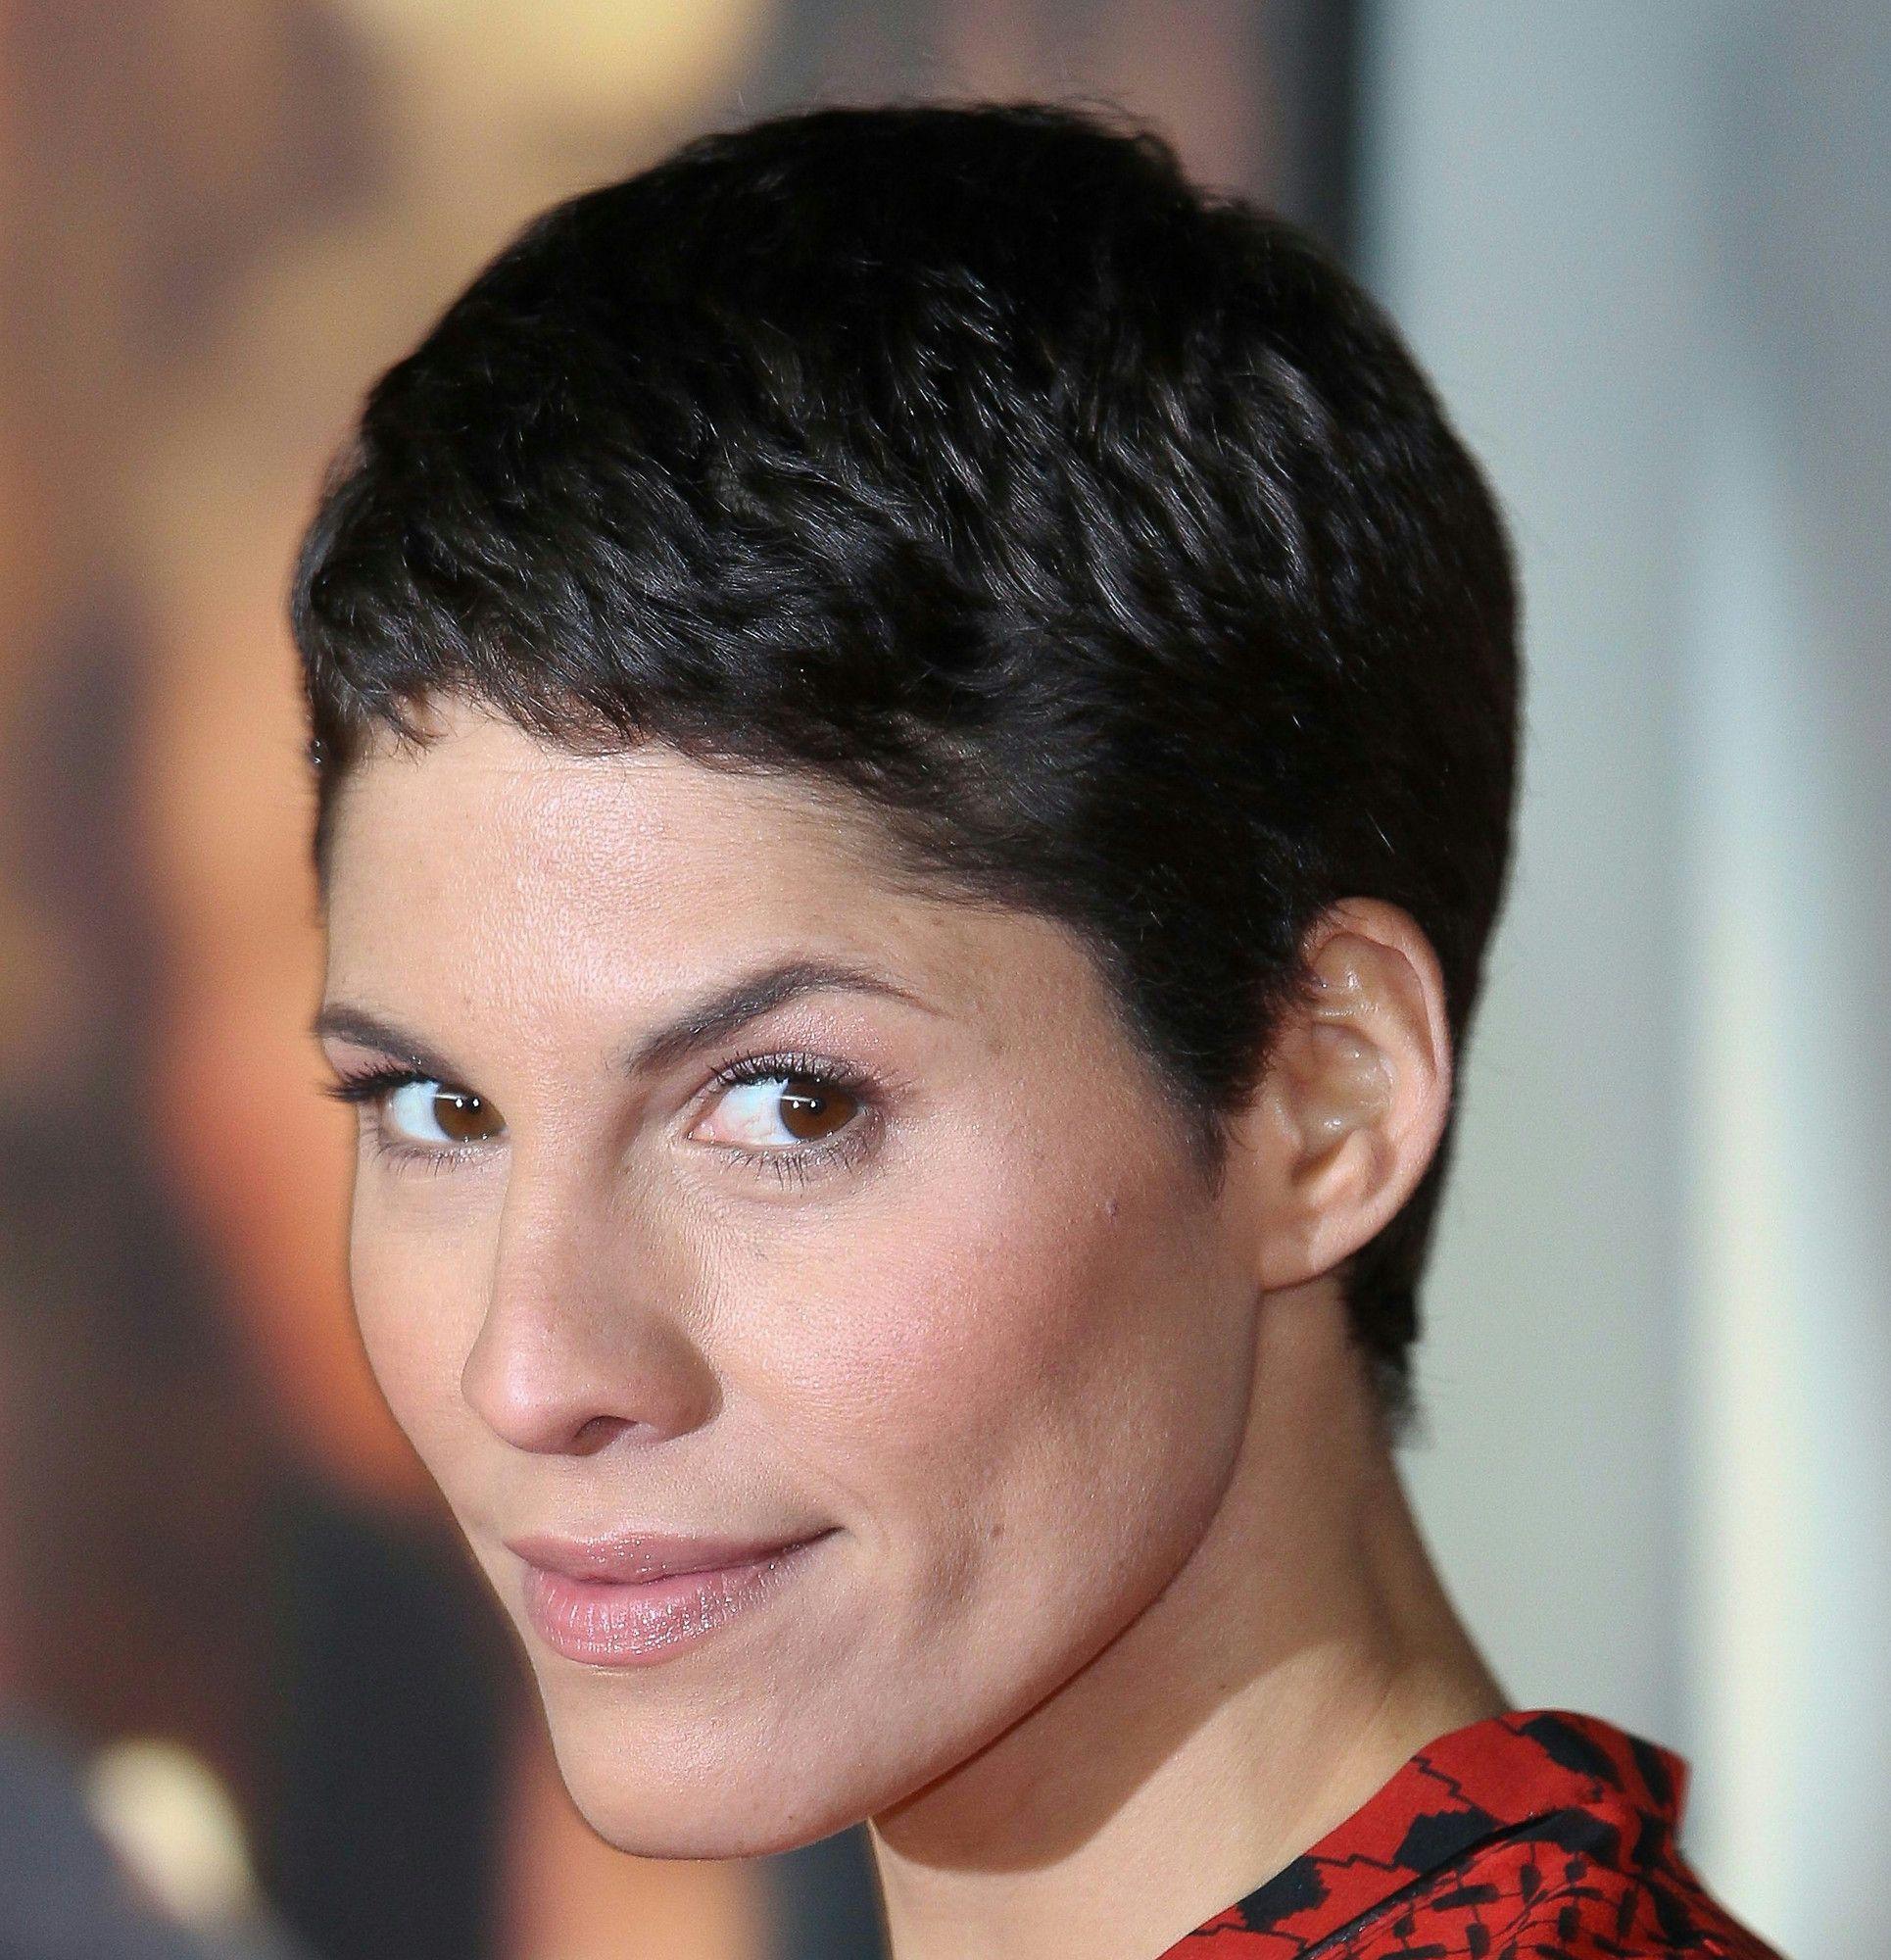 Deutsche Schauspielerin Kurze Haare